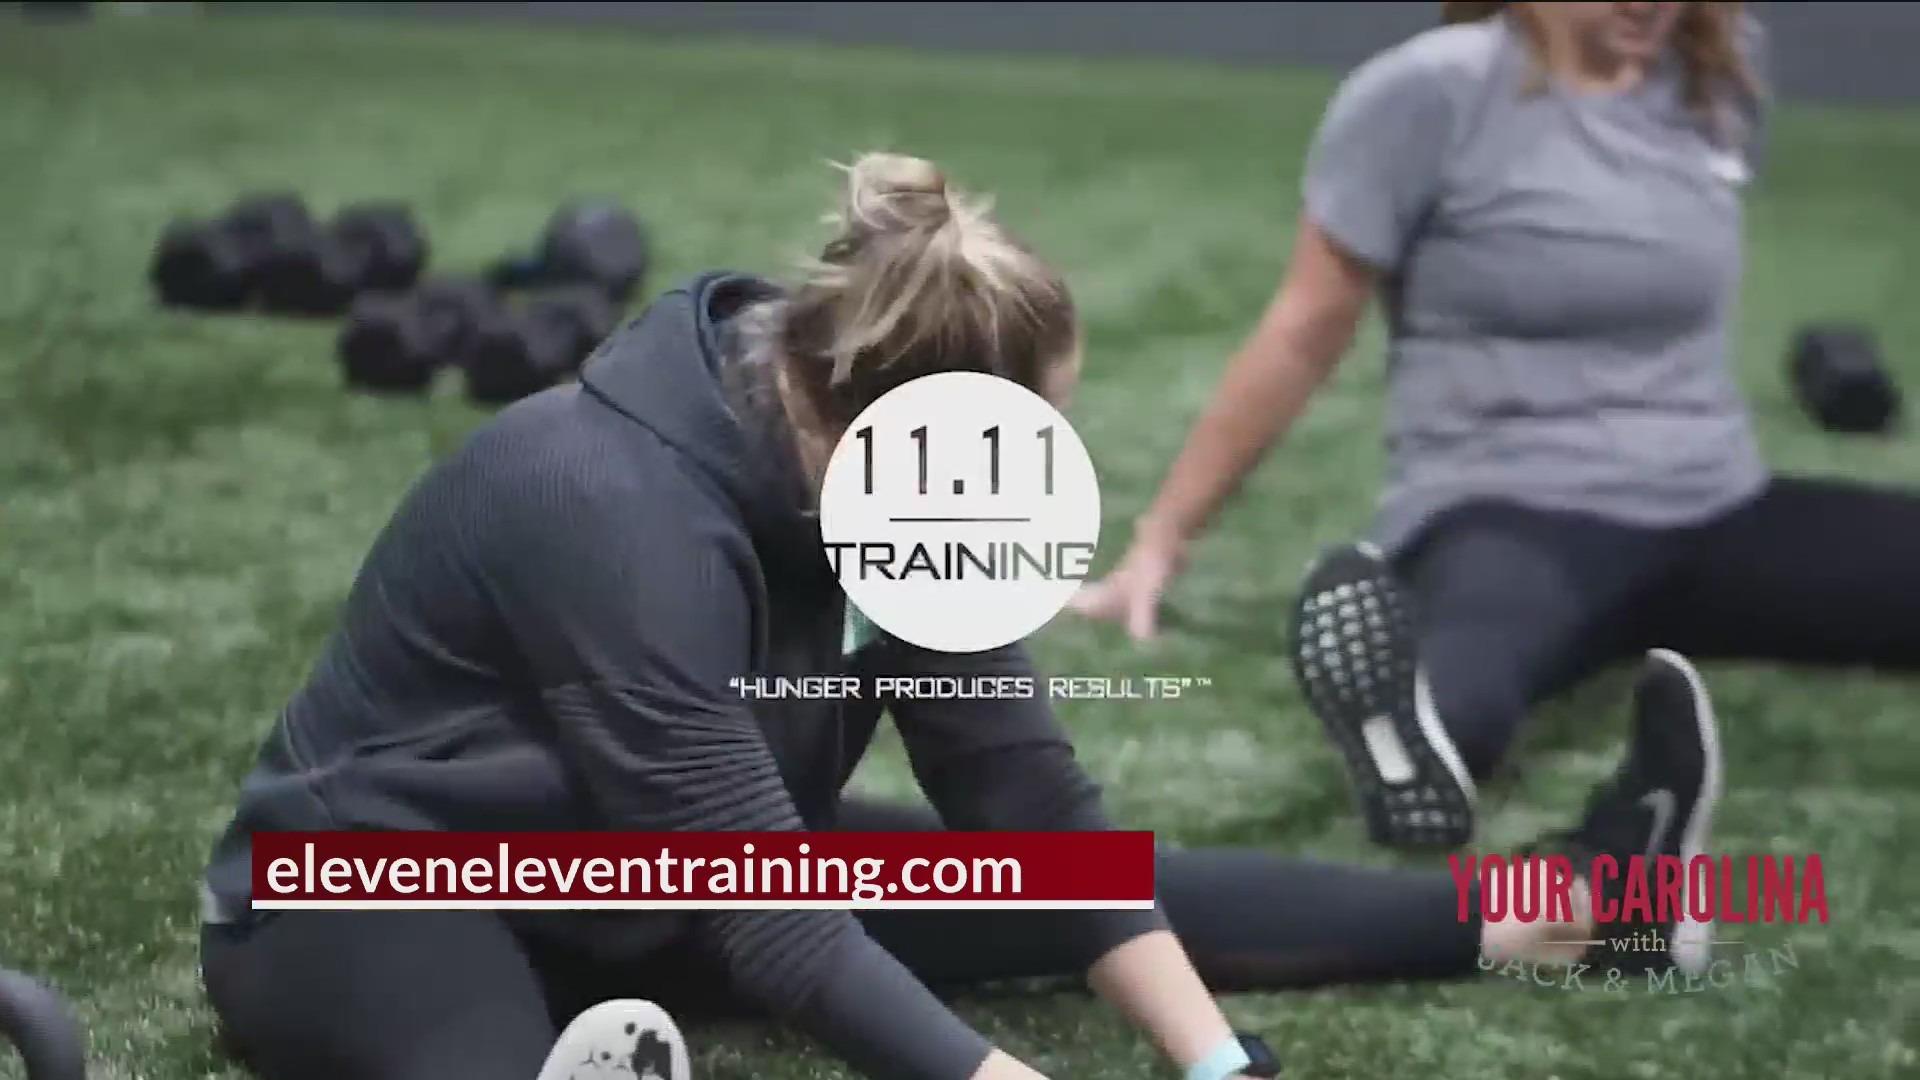 Move it Monday - 11.11 Training